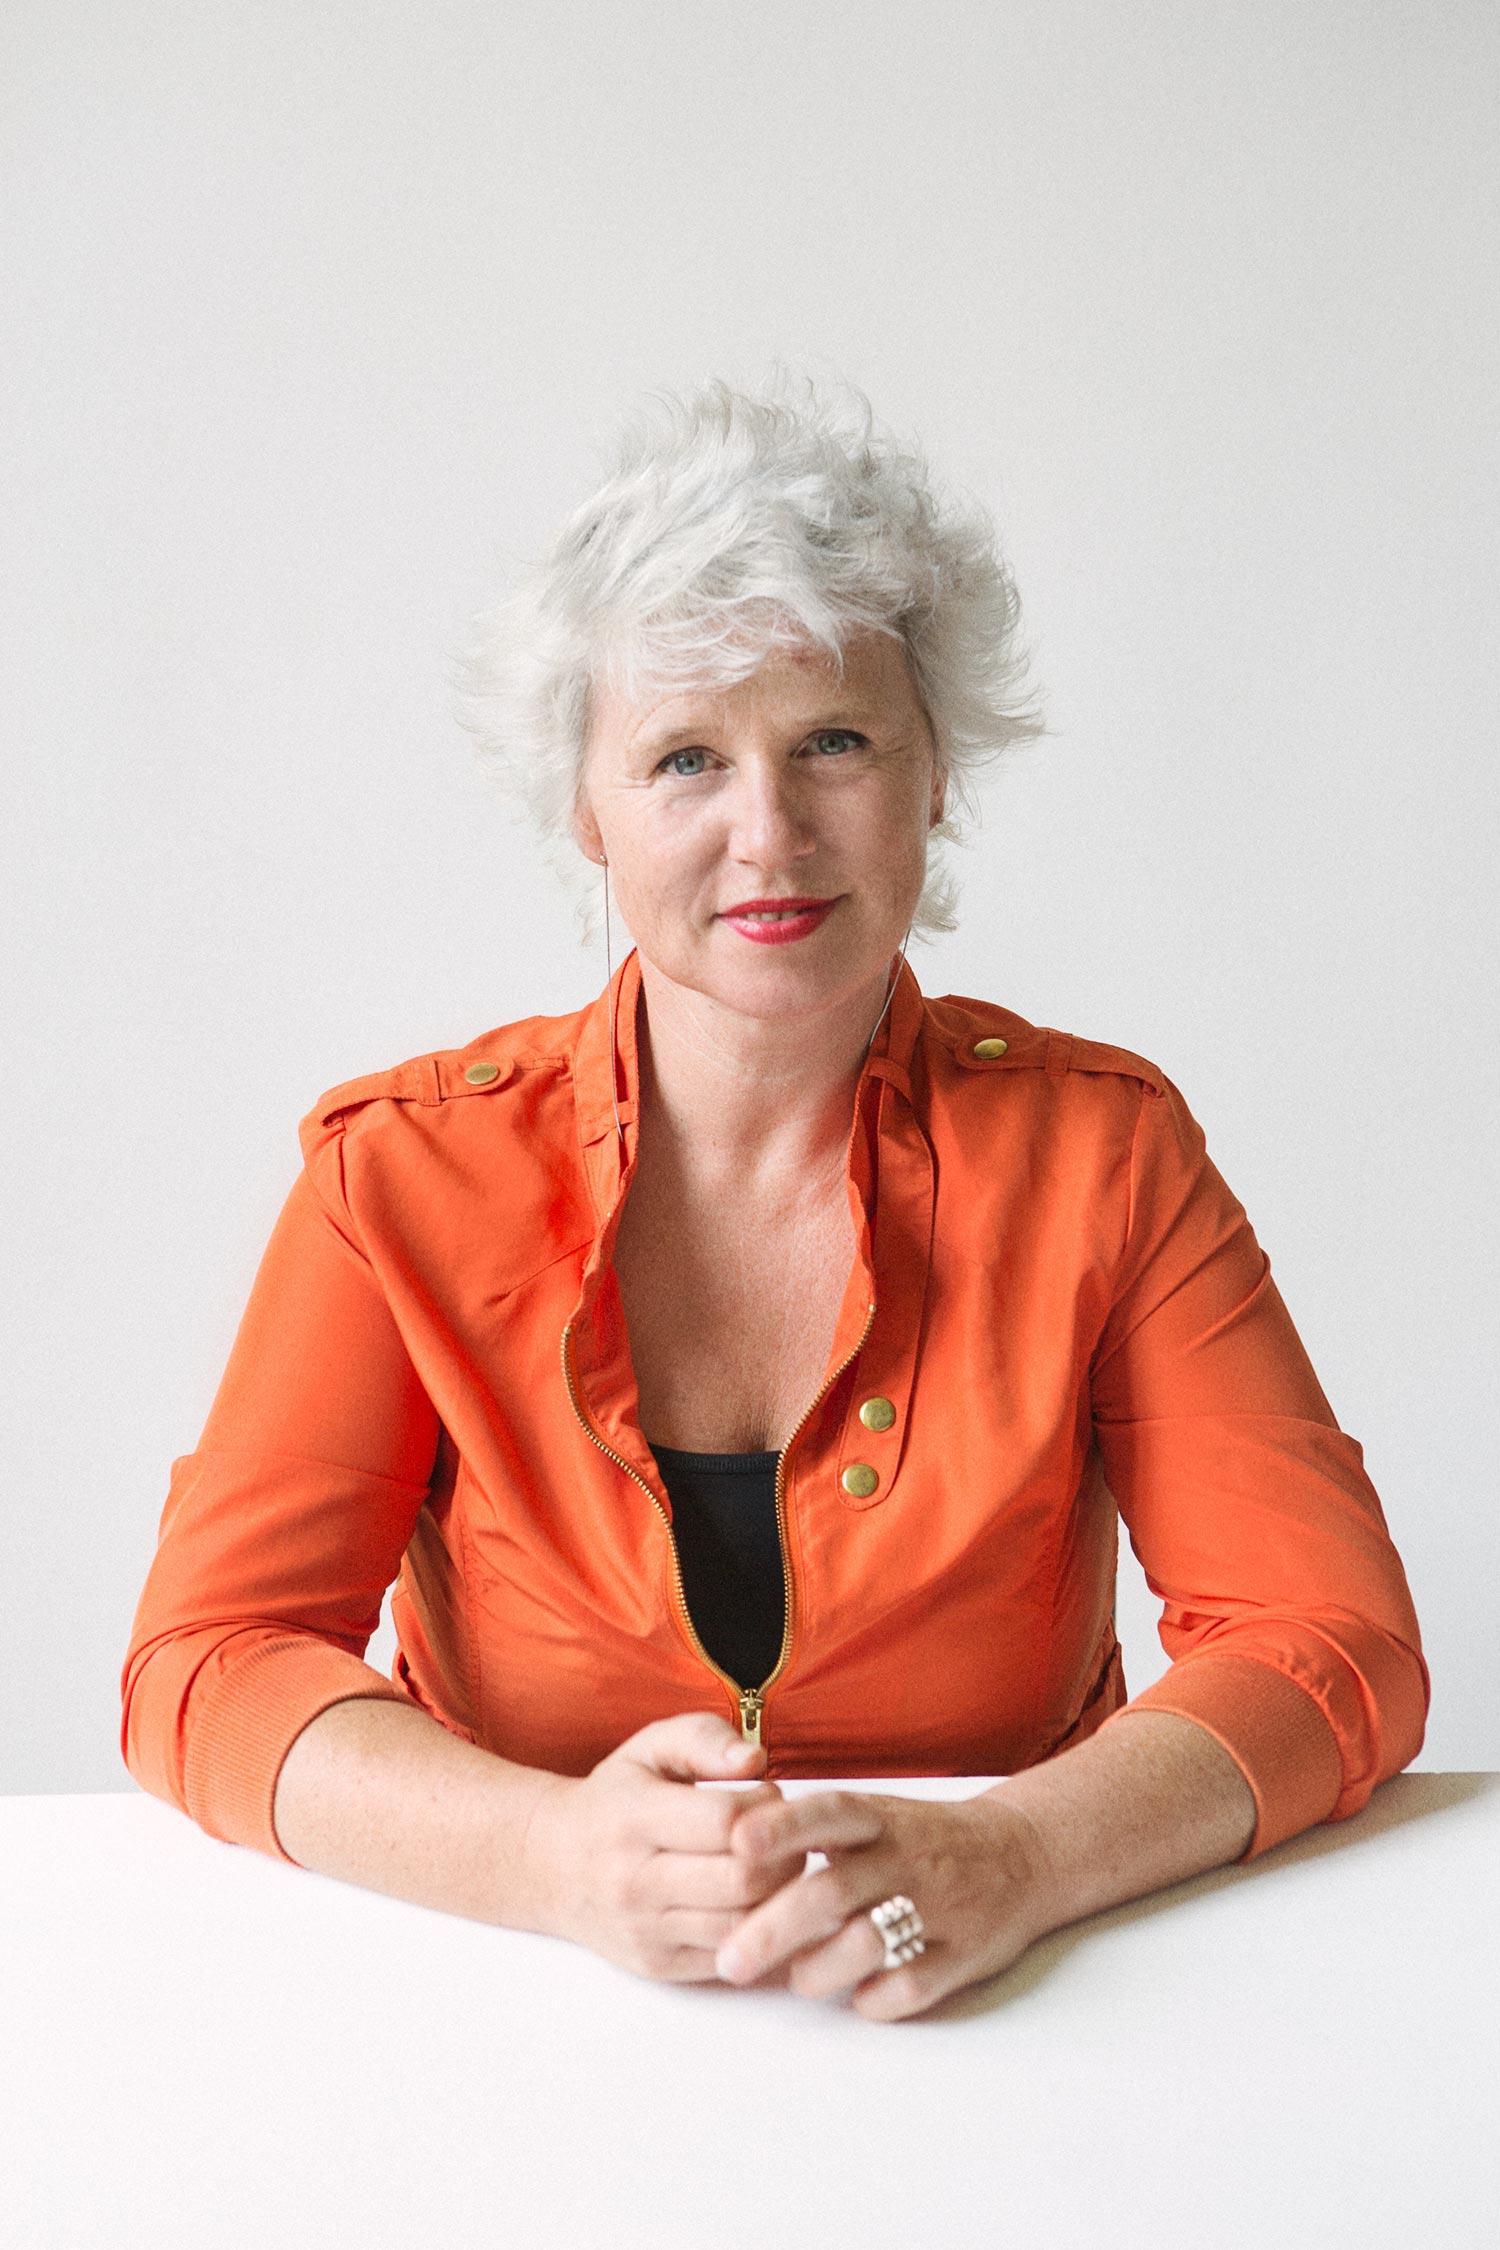 Isabelle Wéry